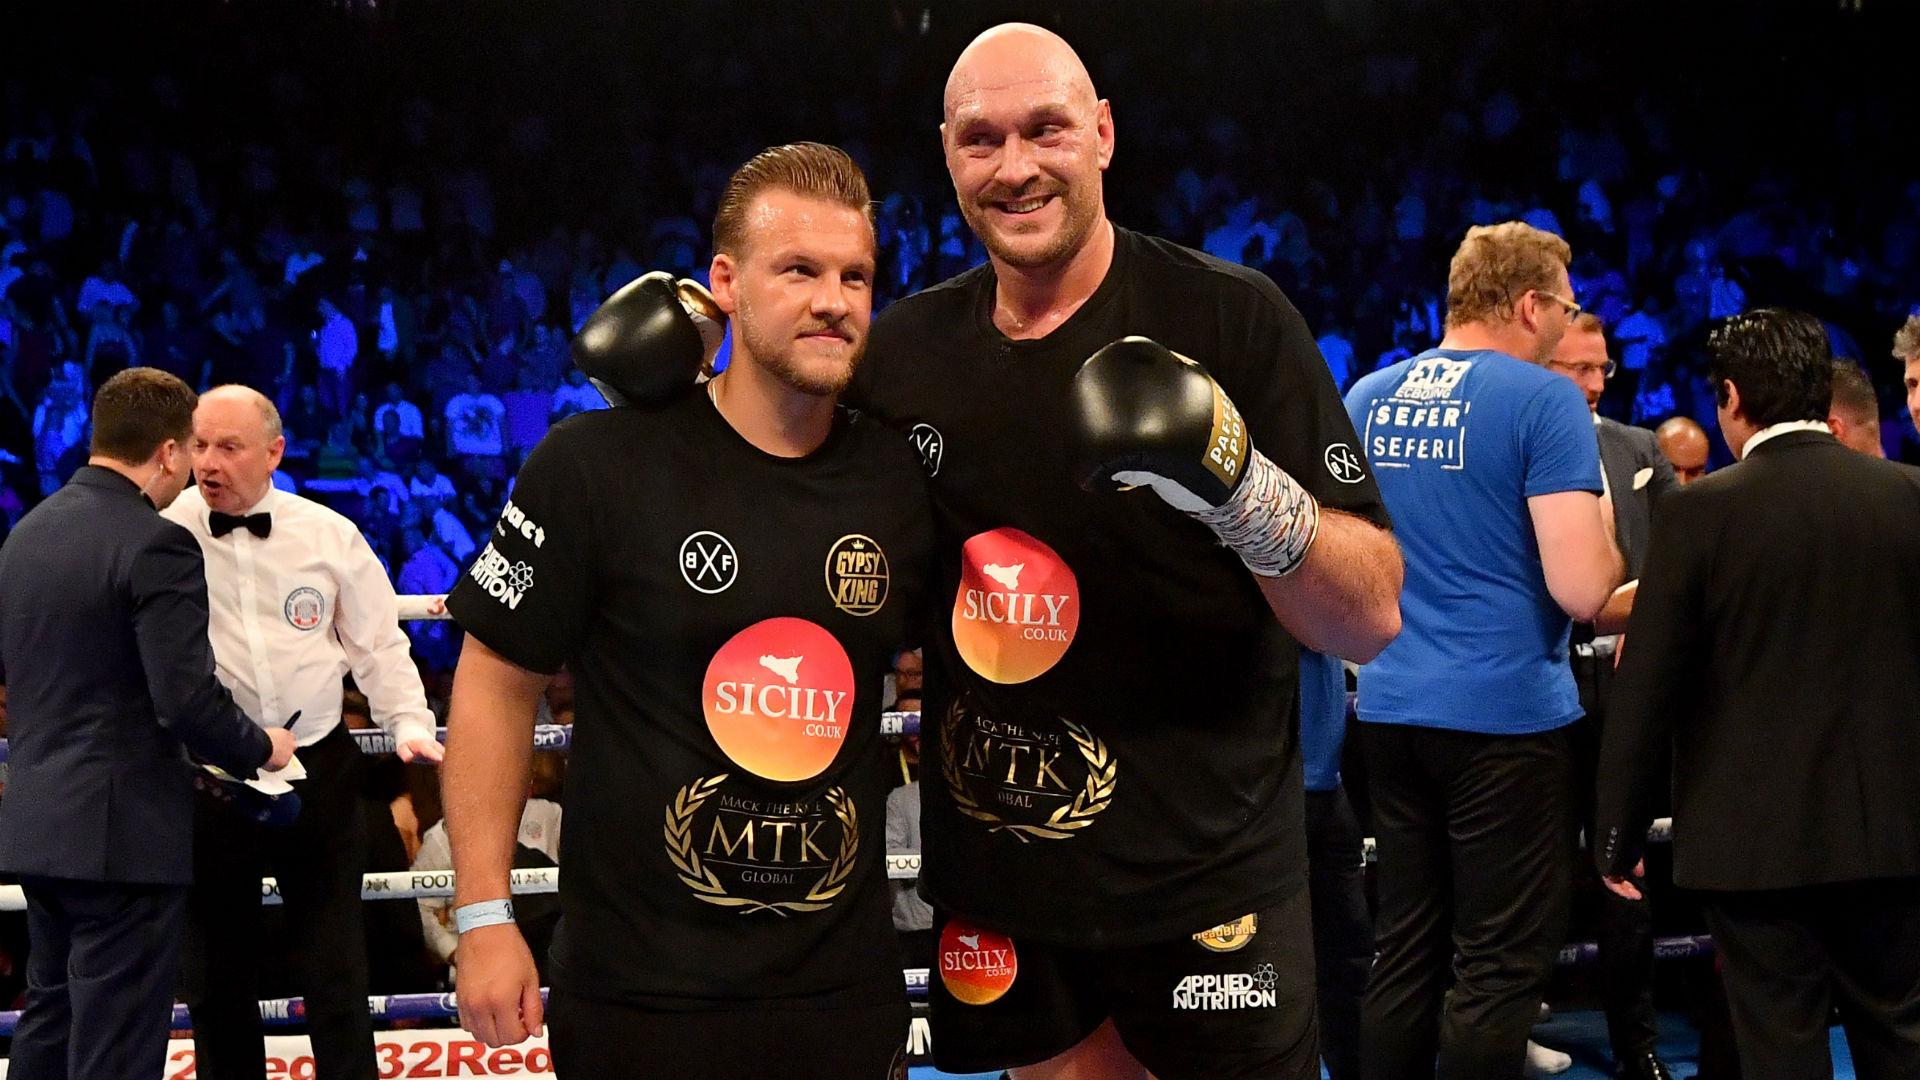 Tyson Fury splits from trainer Ben Davison two months from fight vs. Deontay Wilder